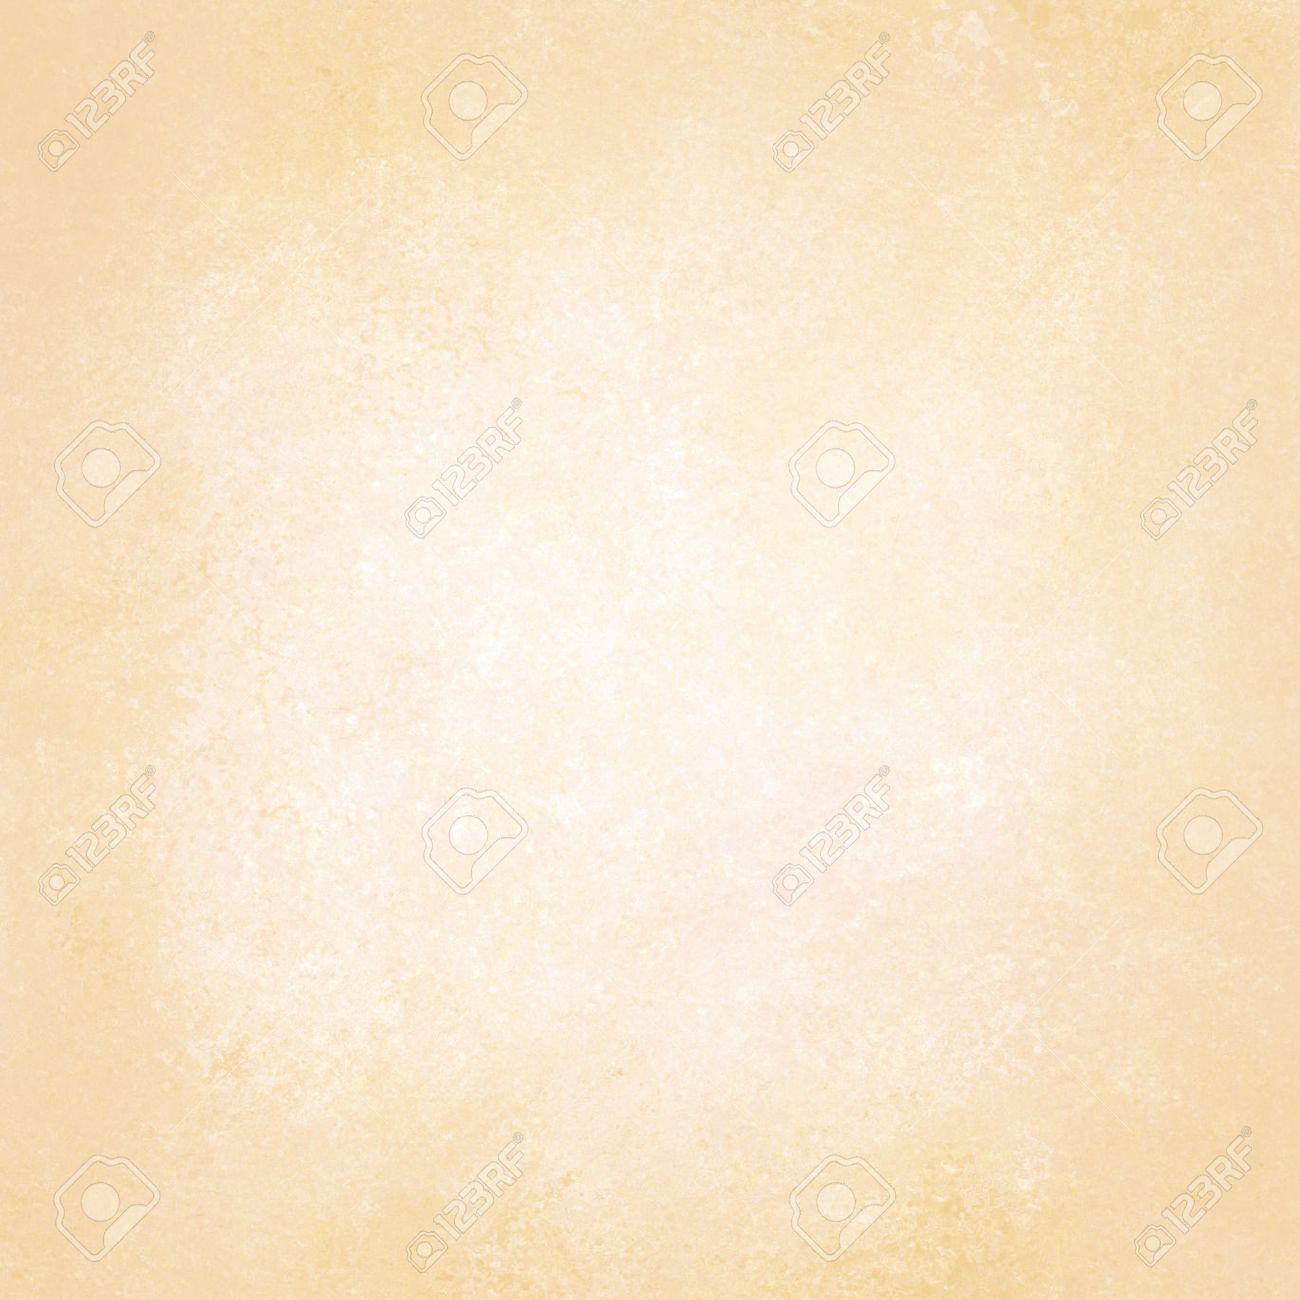 Pastel Beige Background Brown White Or Tan Neutral Color Design Vintage Grunge Texture